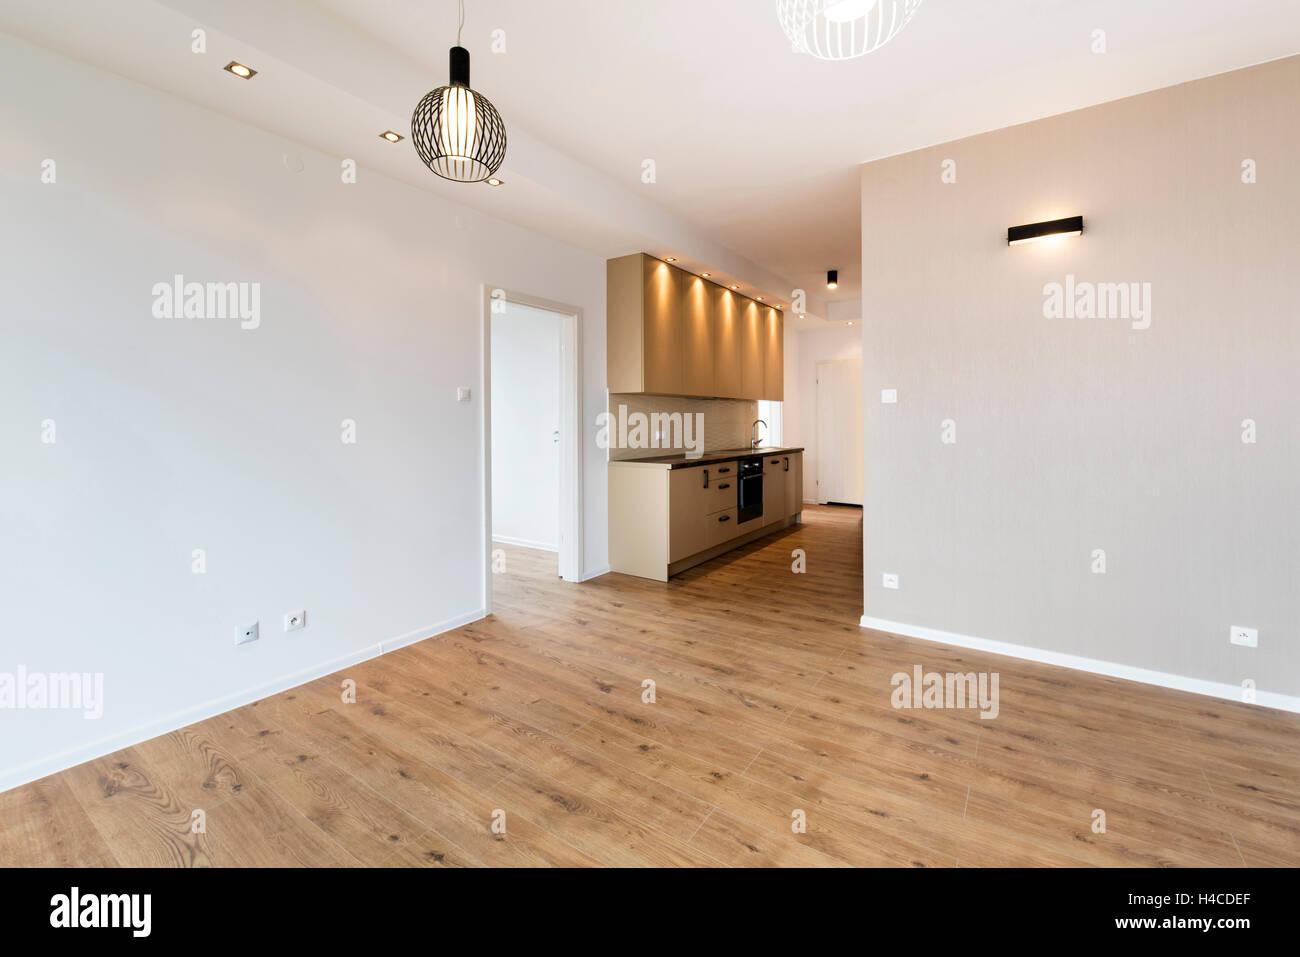 . New apartment  empty room with domestic kitchen interior design